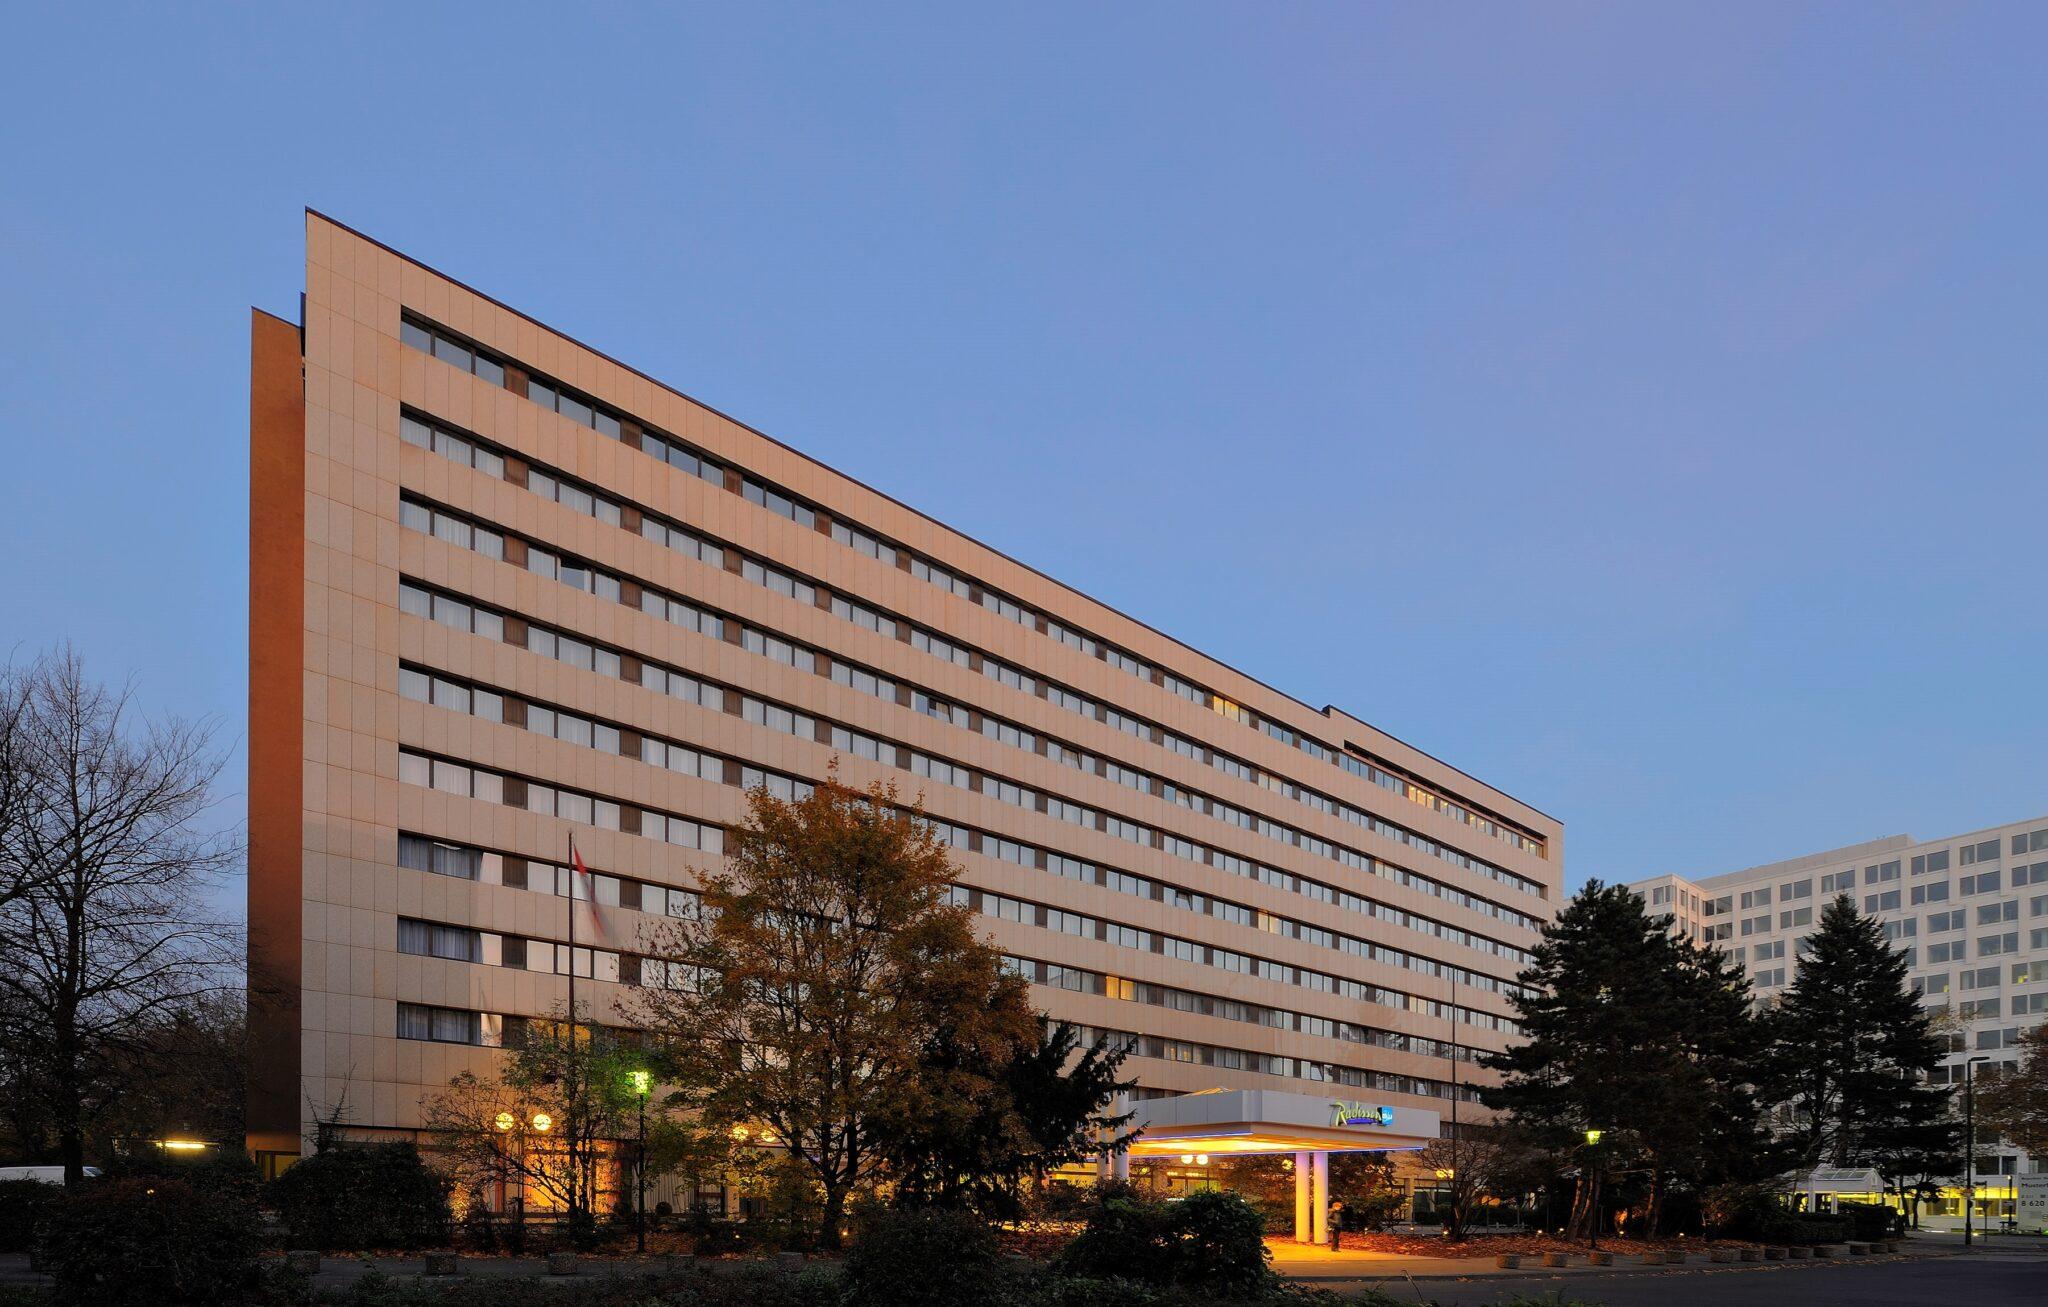 Radisson Blu Conference Hotel, Düsseldorf